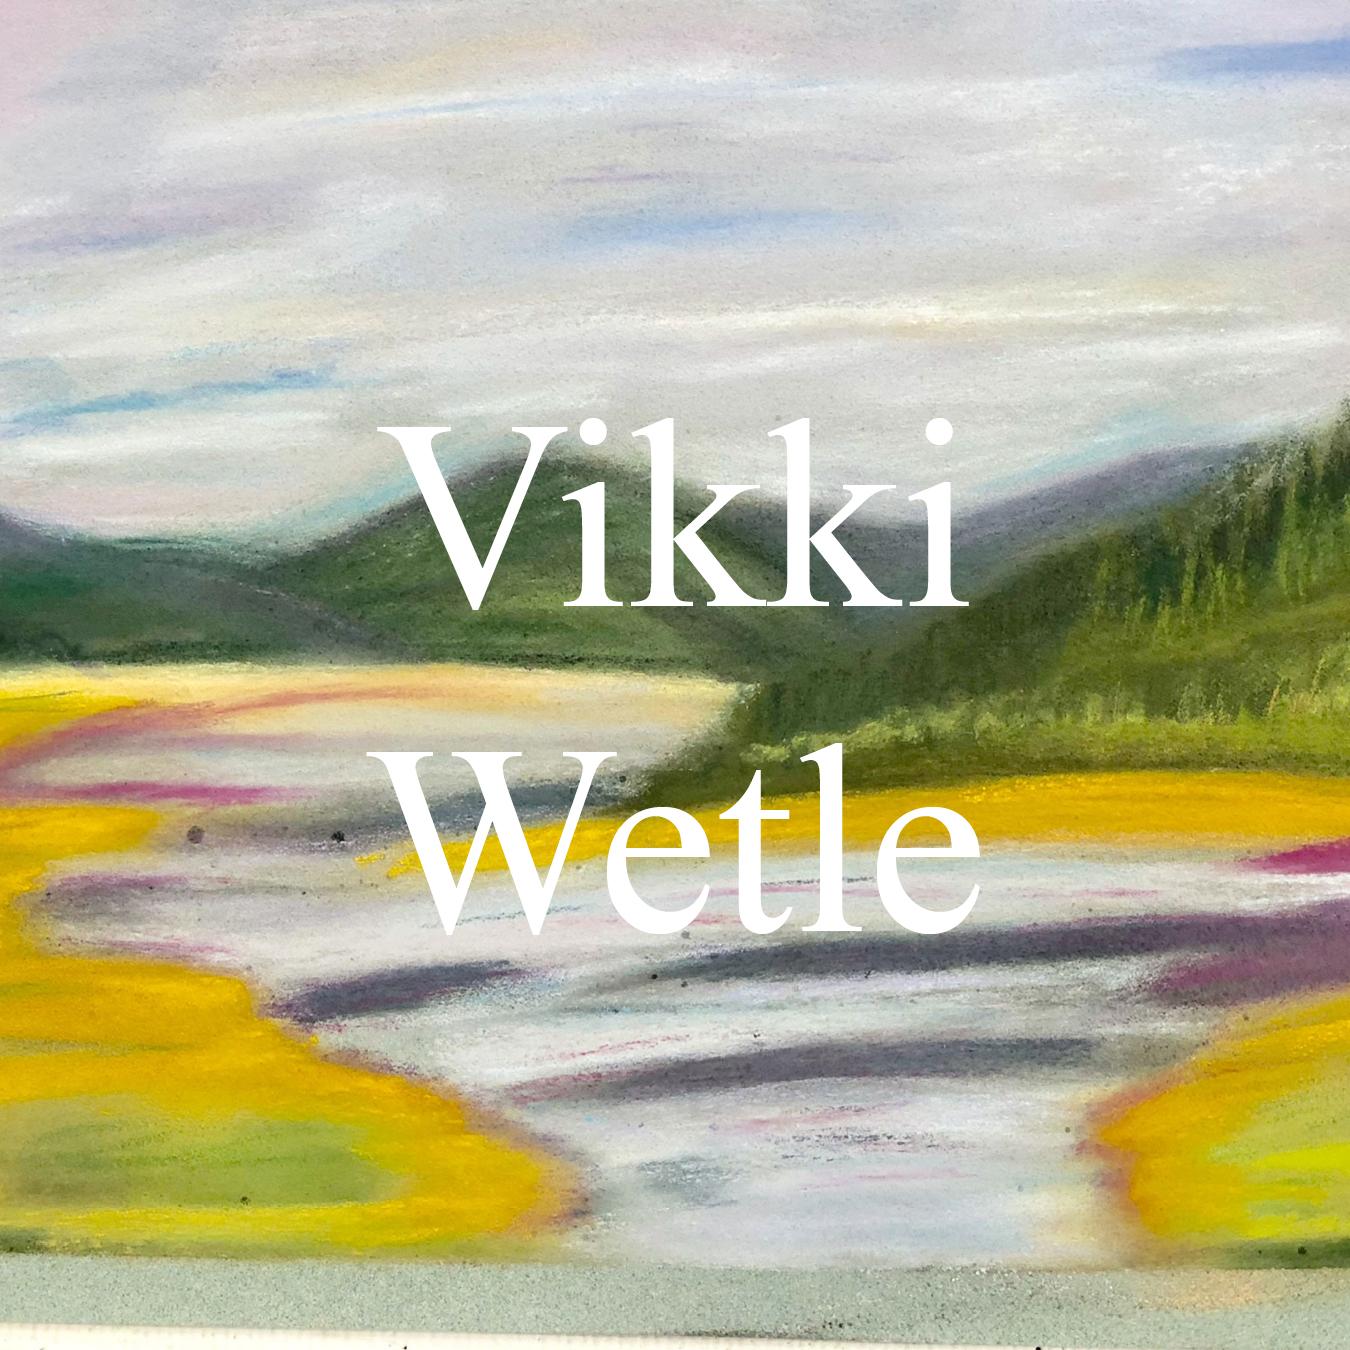 Wetle (ArtByTown).jpg